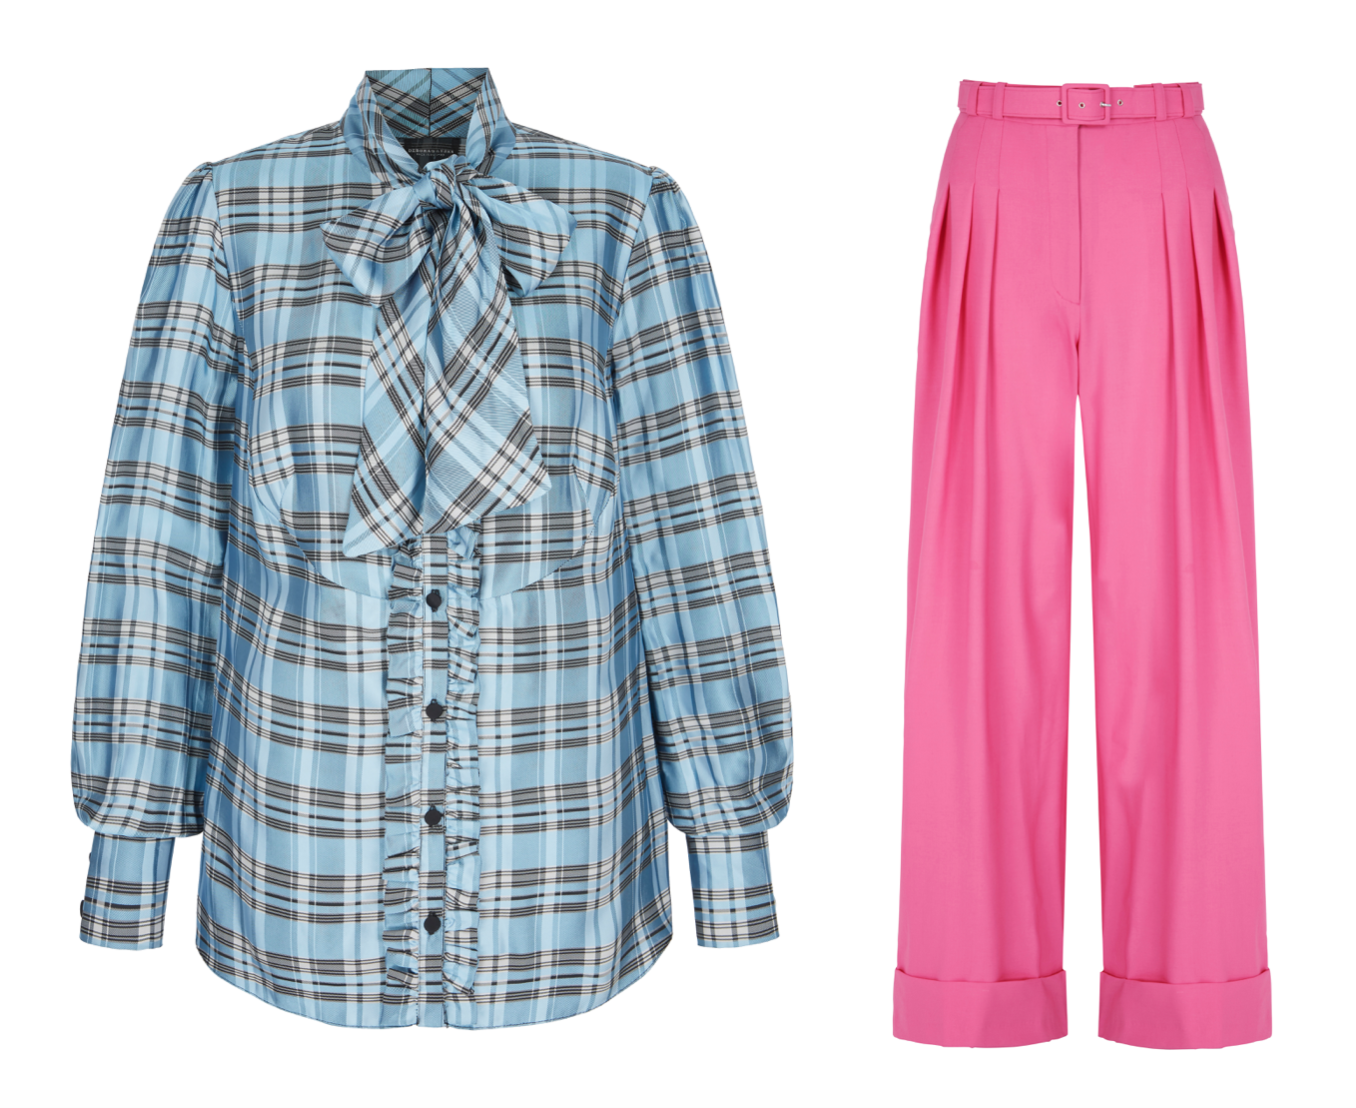 self-isolation-style-lockdown-looks-loungewear-look-good-deborah-lyons